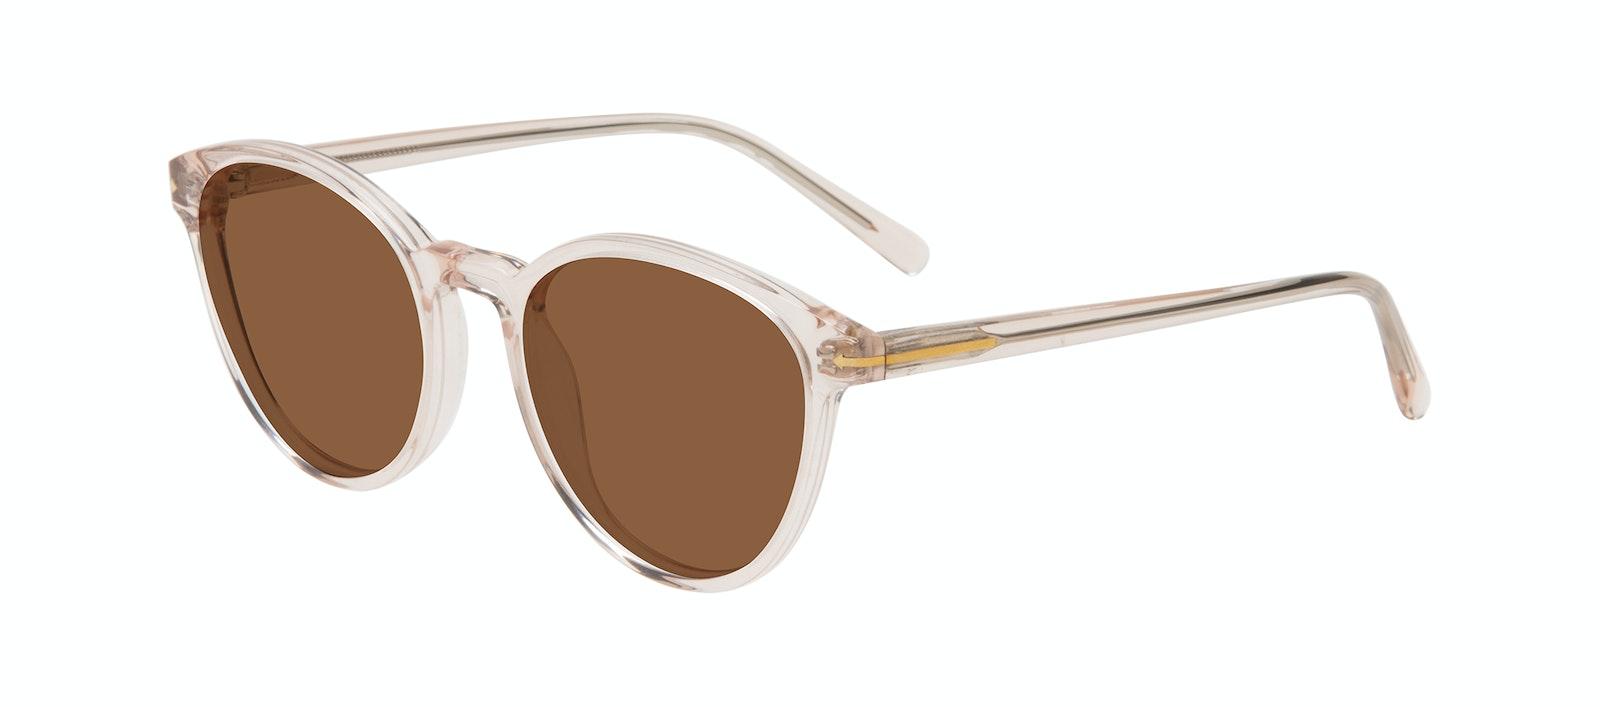 Affordable Fashion Glasses Round Sunglasses Women London Vanilla Tilt